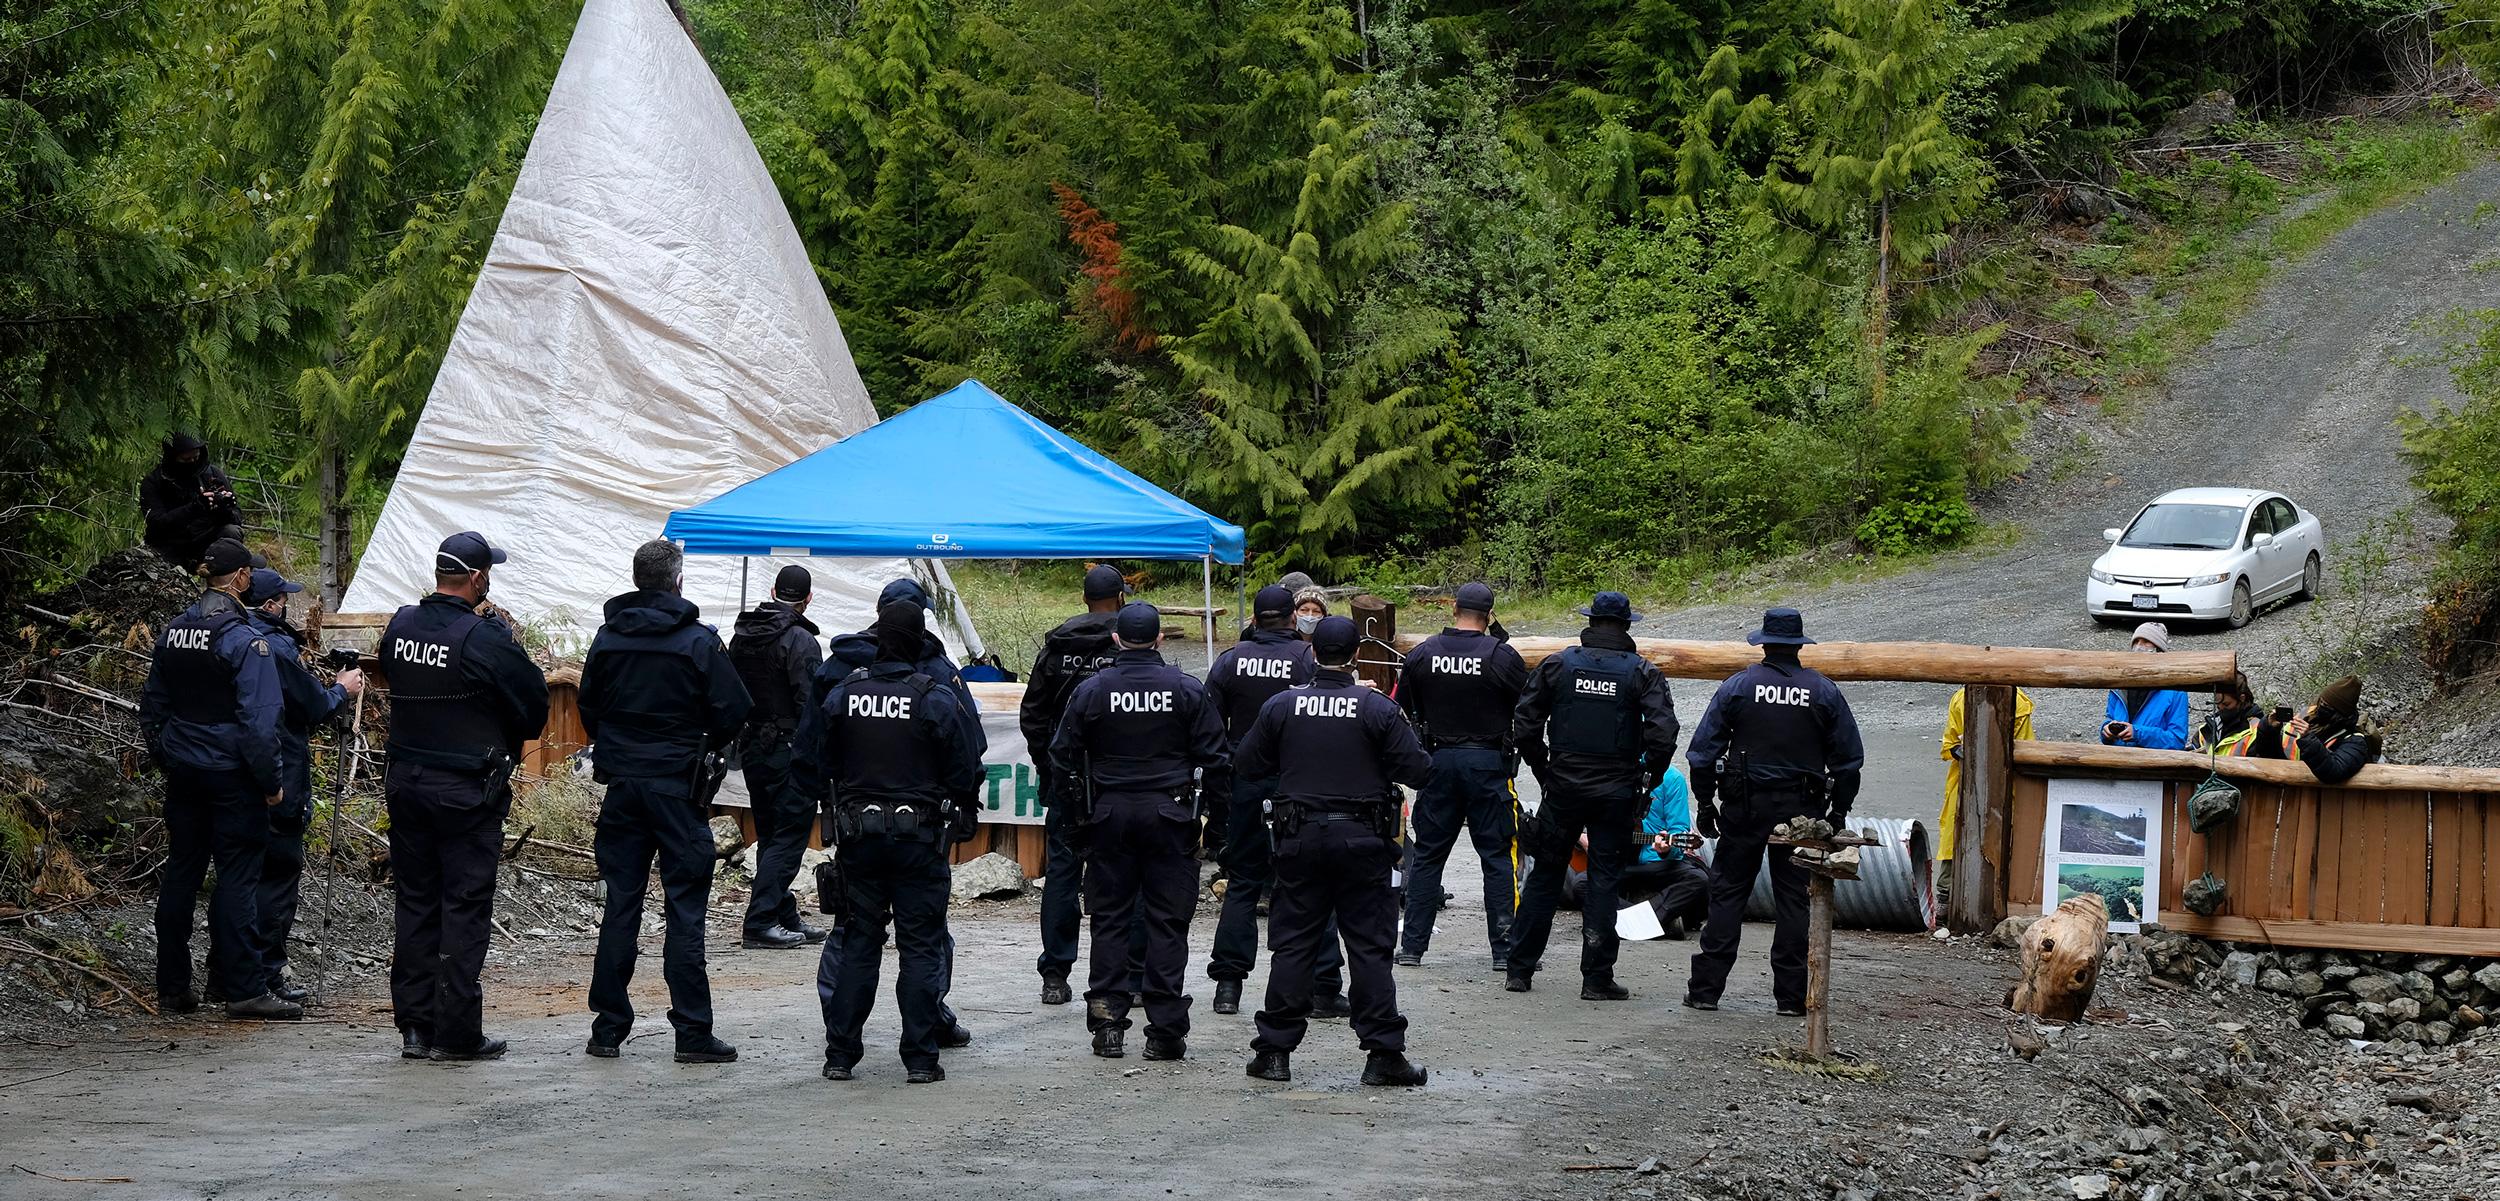 RCMP officers approach anti-logging blockade